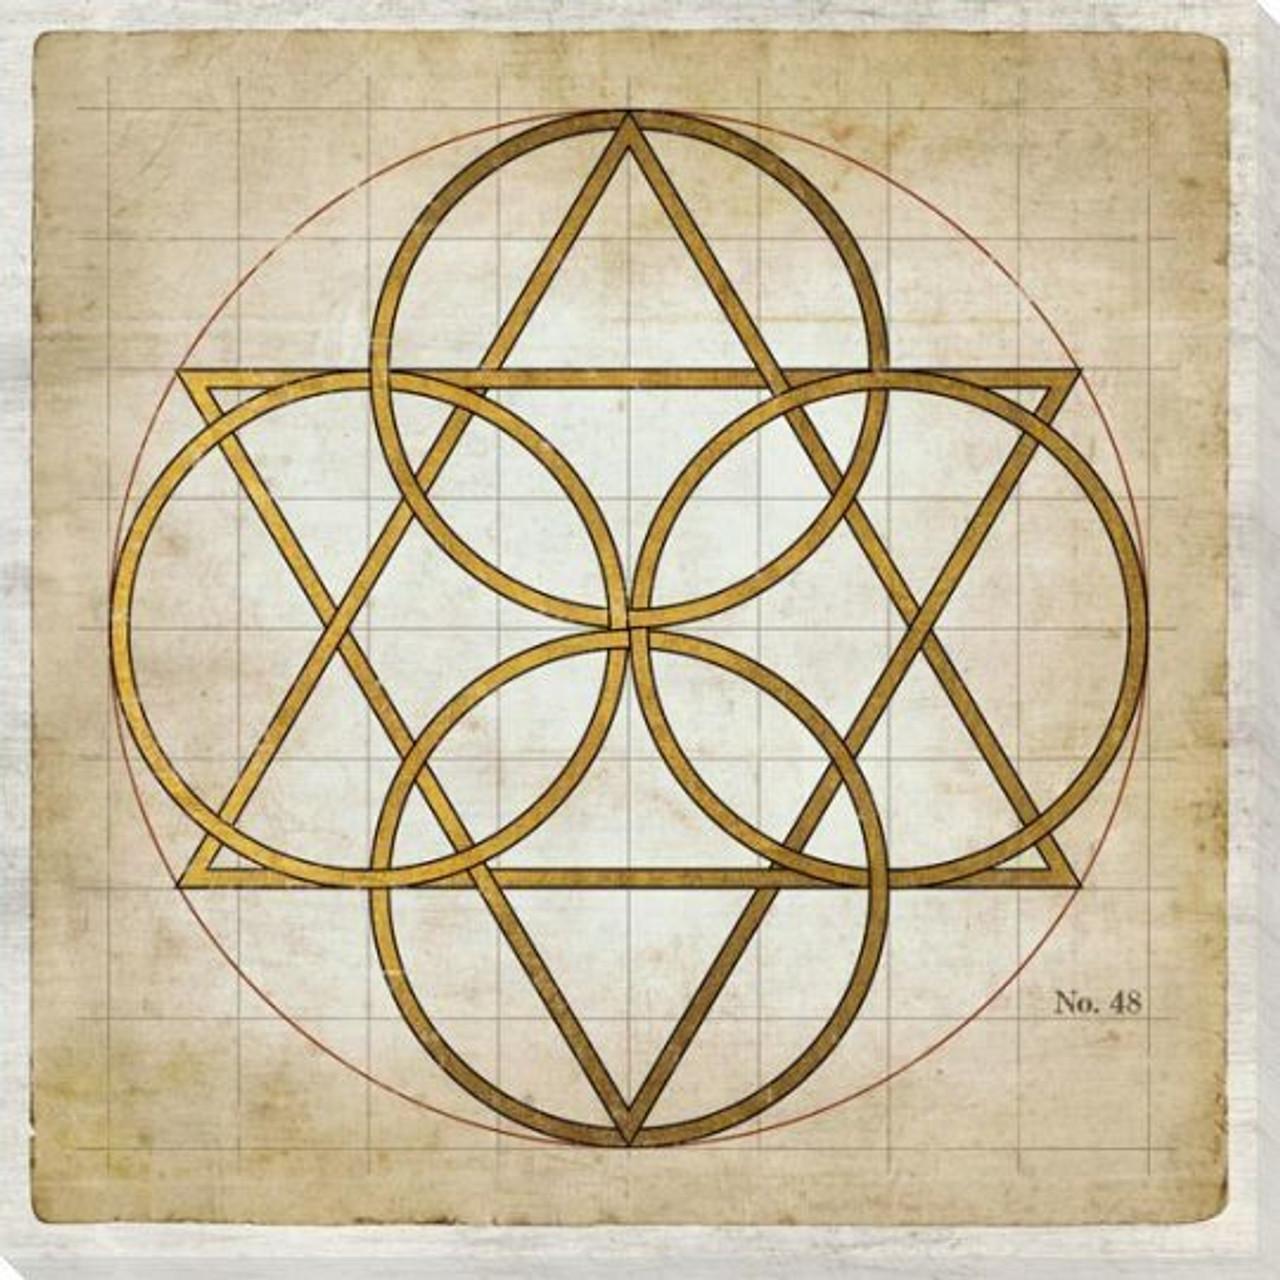 Geometric Art Prints